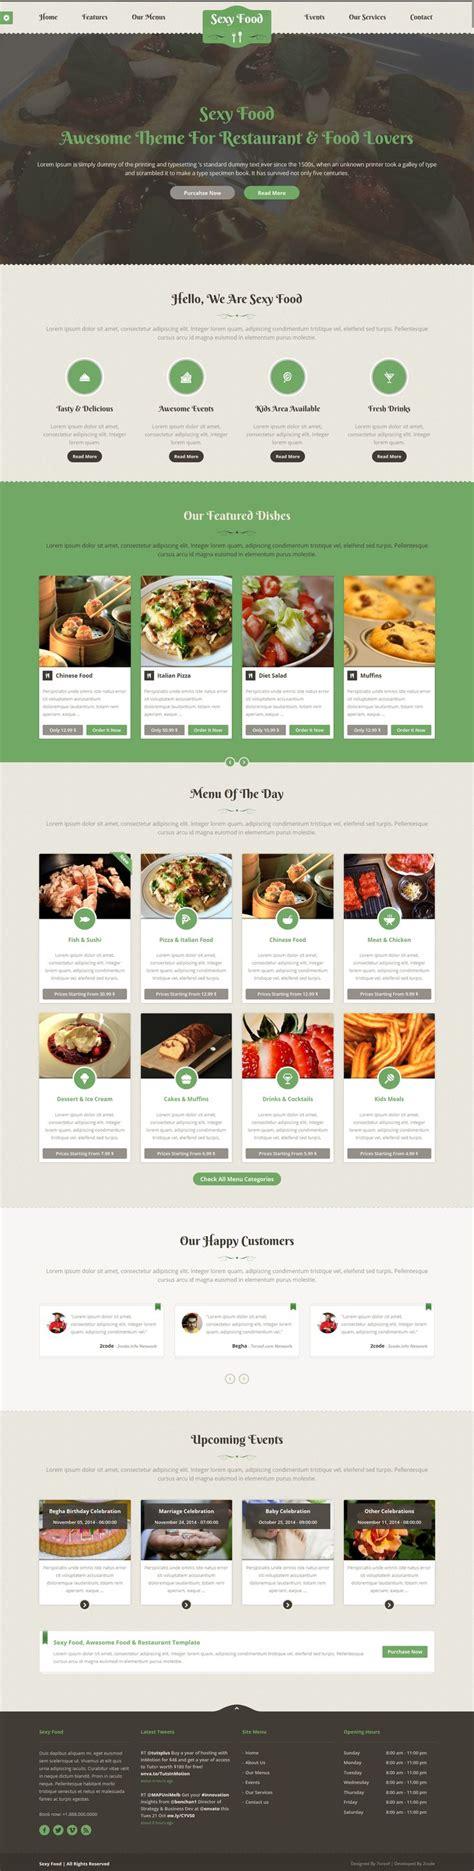 wordpress restaurant layout sexy food food restaurant wordpress theme web design